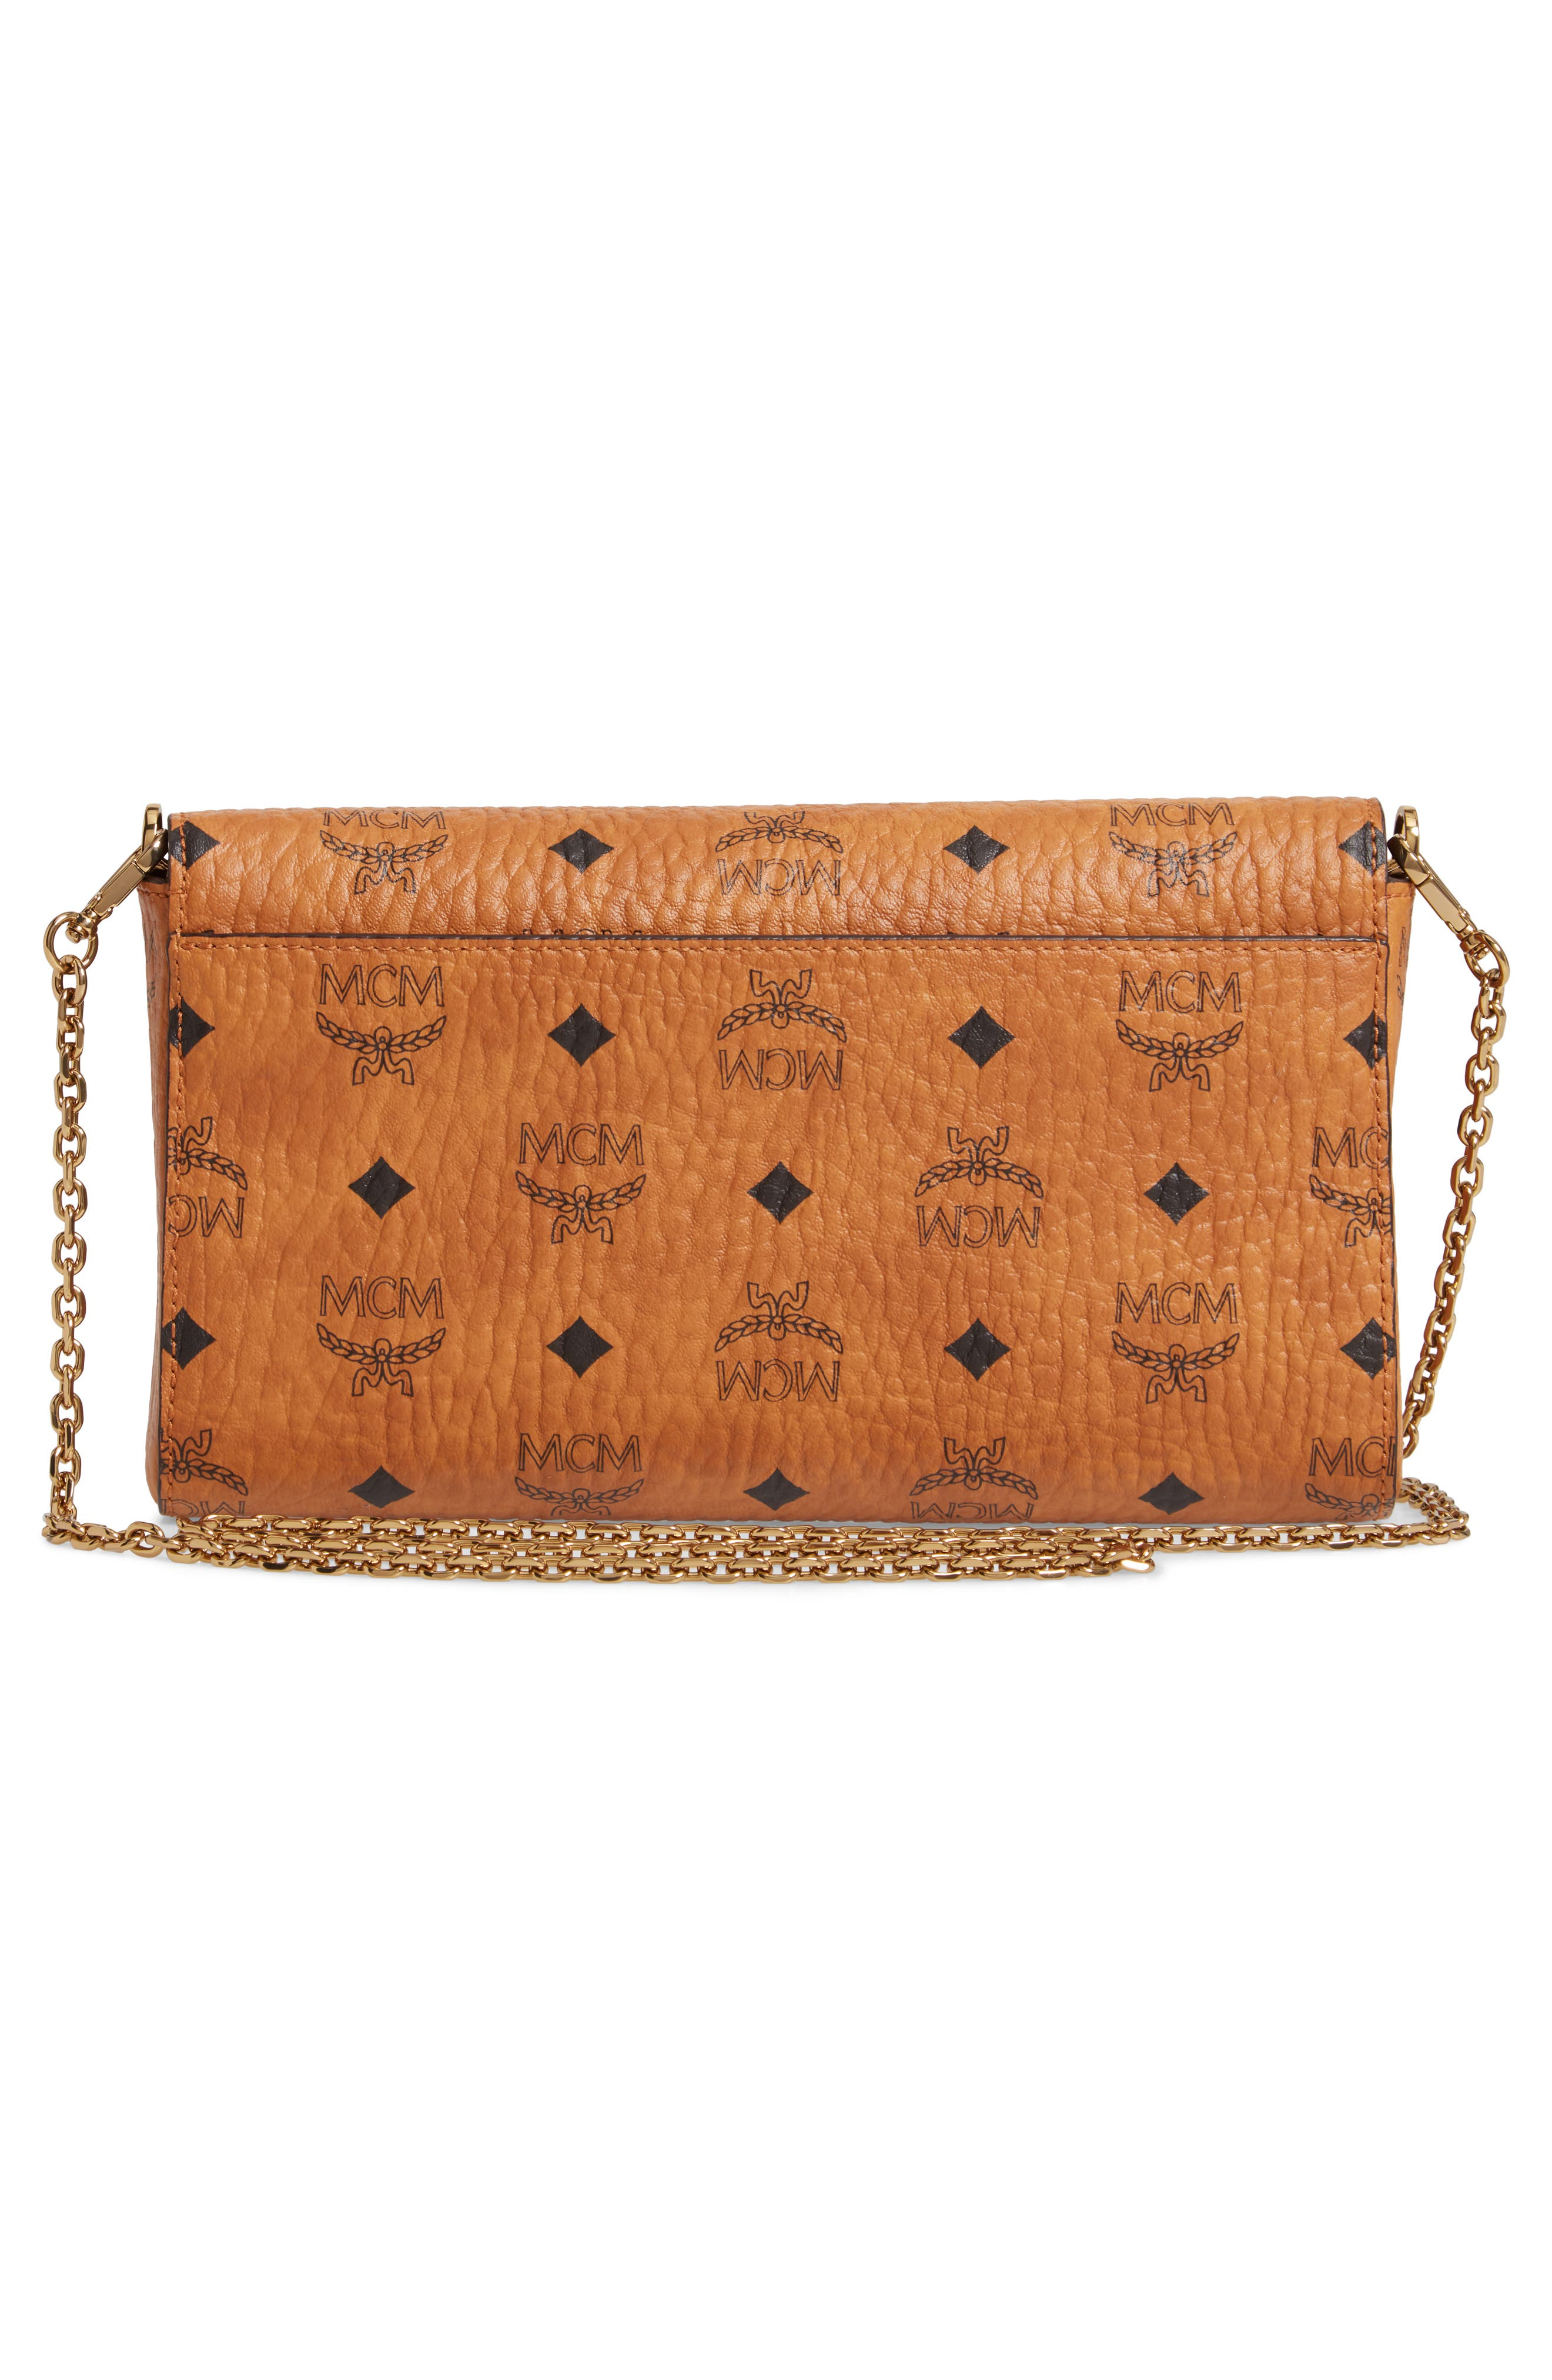 Millie Monogrammed Leather Crossbody Bag,                             Alternate thumbnail 3, color,                             COGNAC BROWN